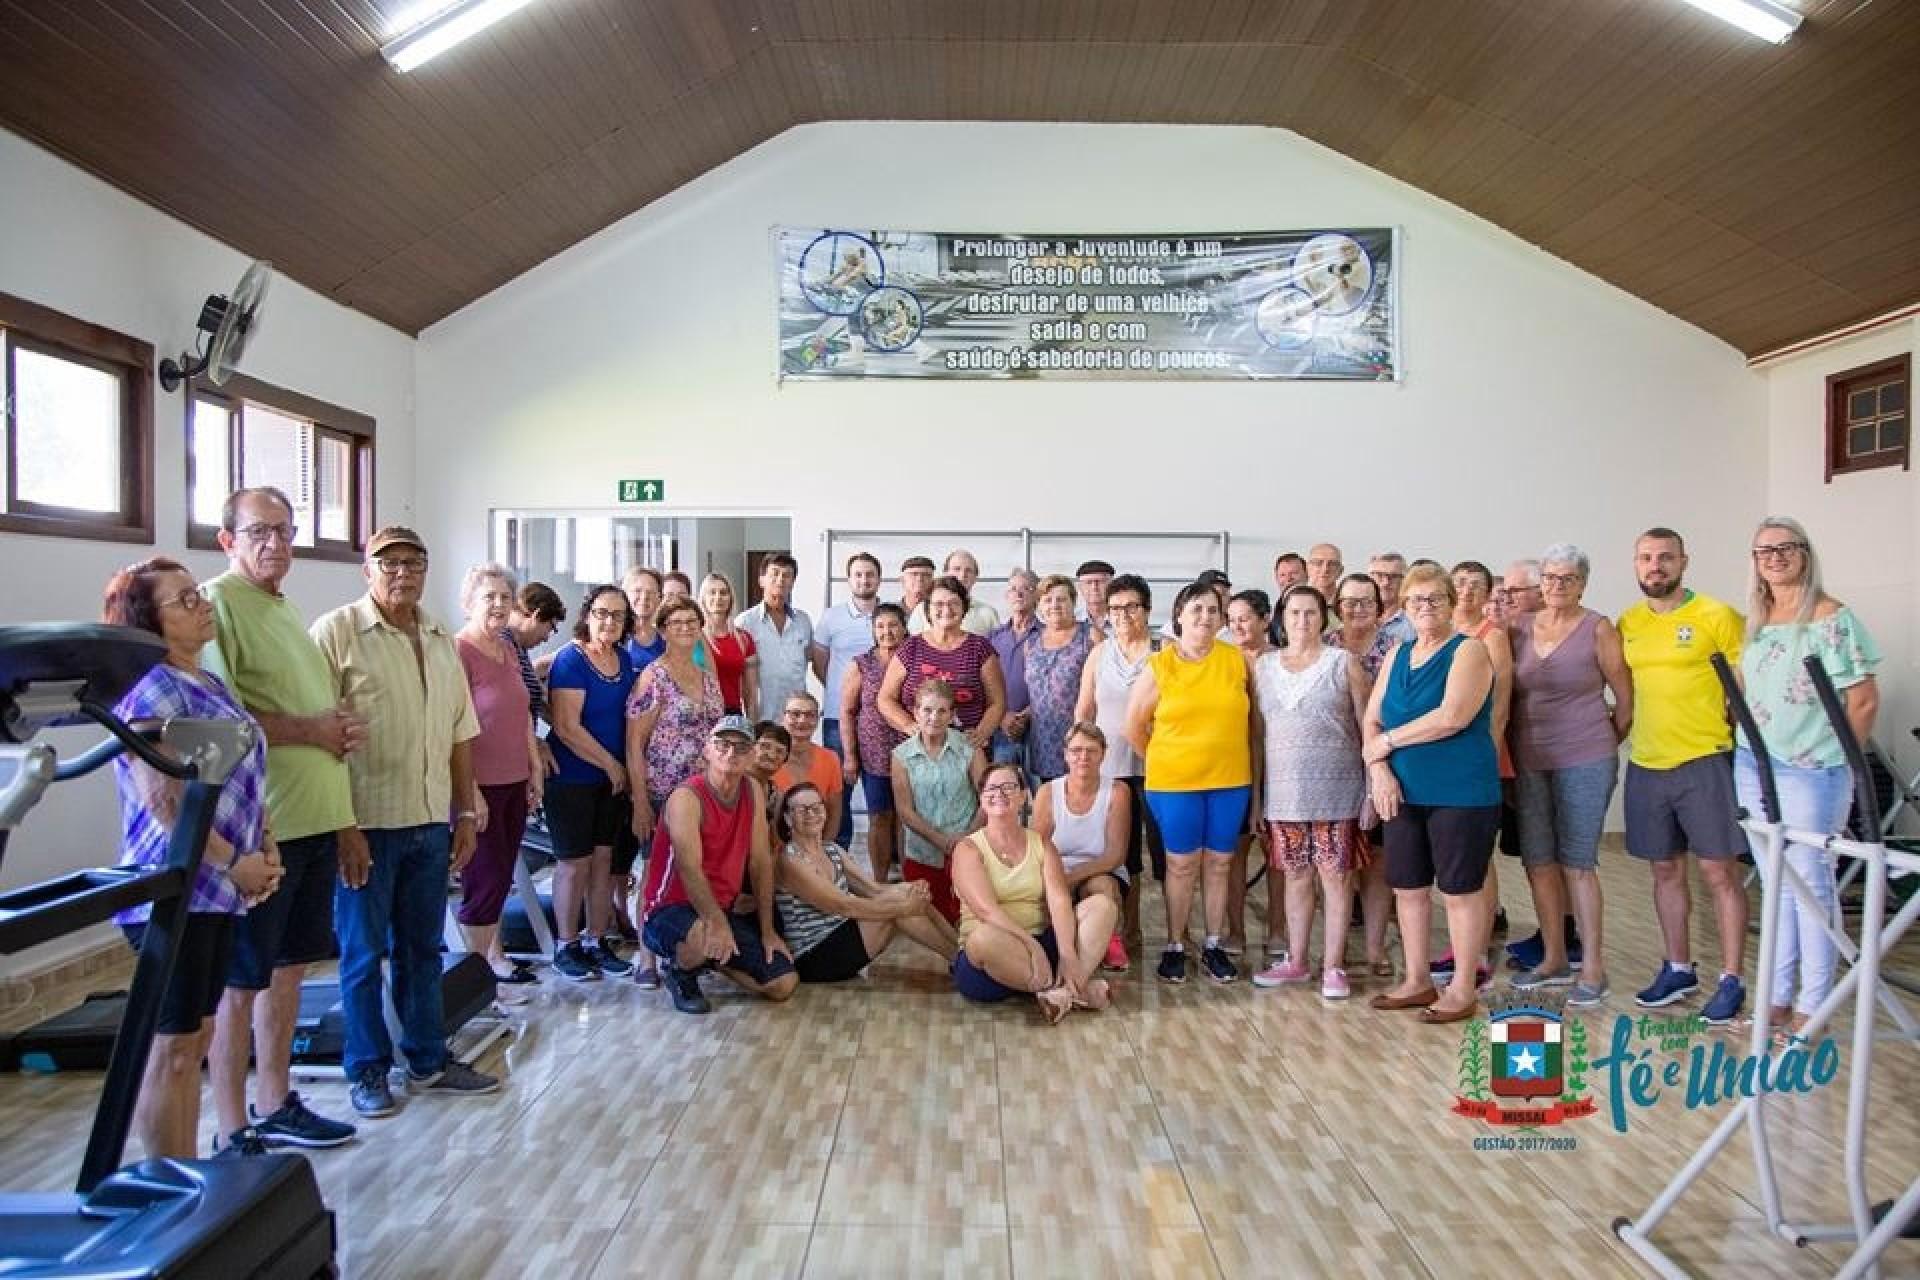 Grupo de Idosos Sempre Alegre do Centro de Missal adquire duas esteiras novas para academia